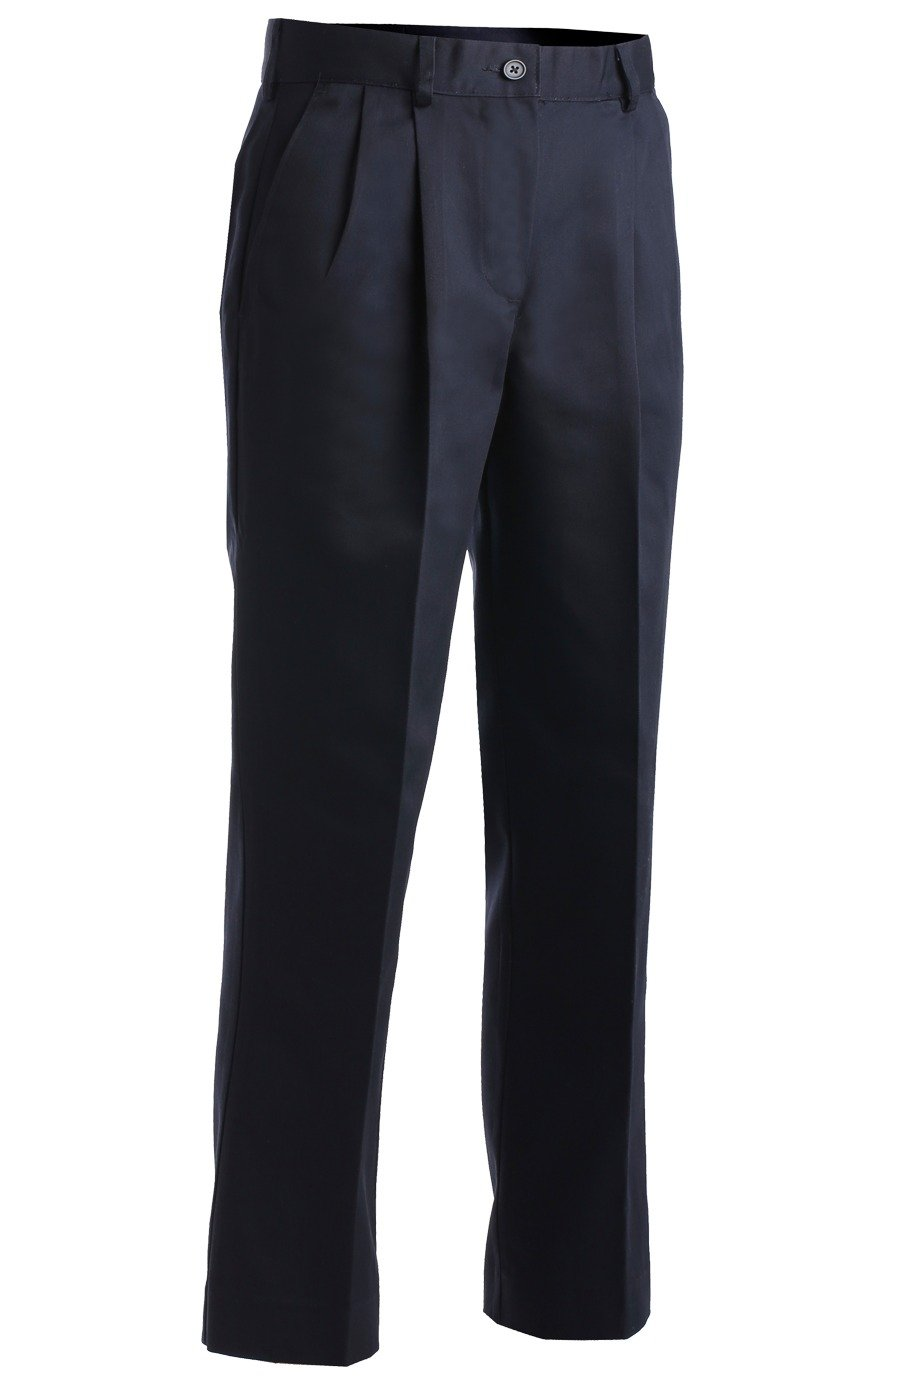 Edwards Garment PANTS レディース B00YPNB8L8 22W 28|ネイビー ネイビー 22W 28